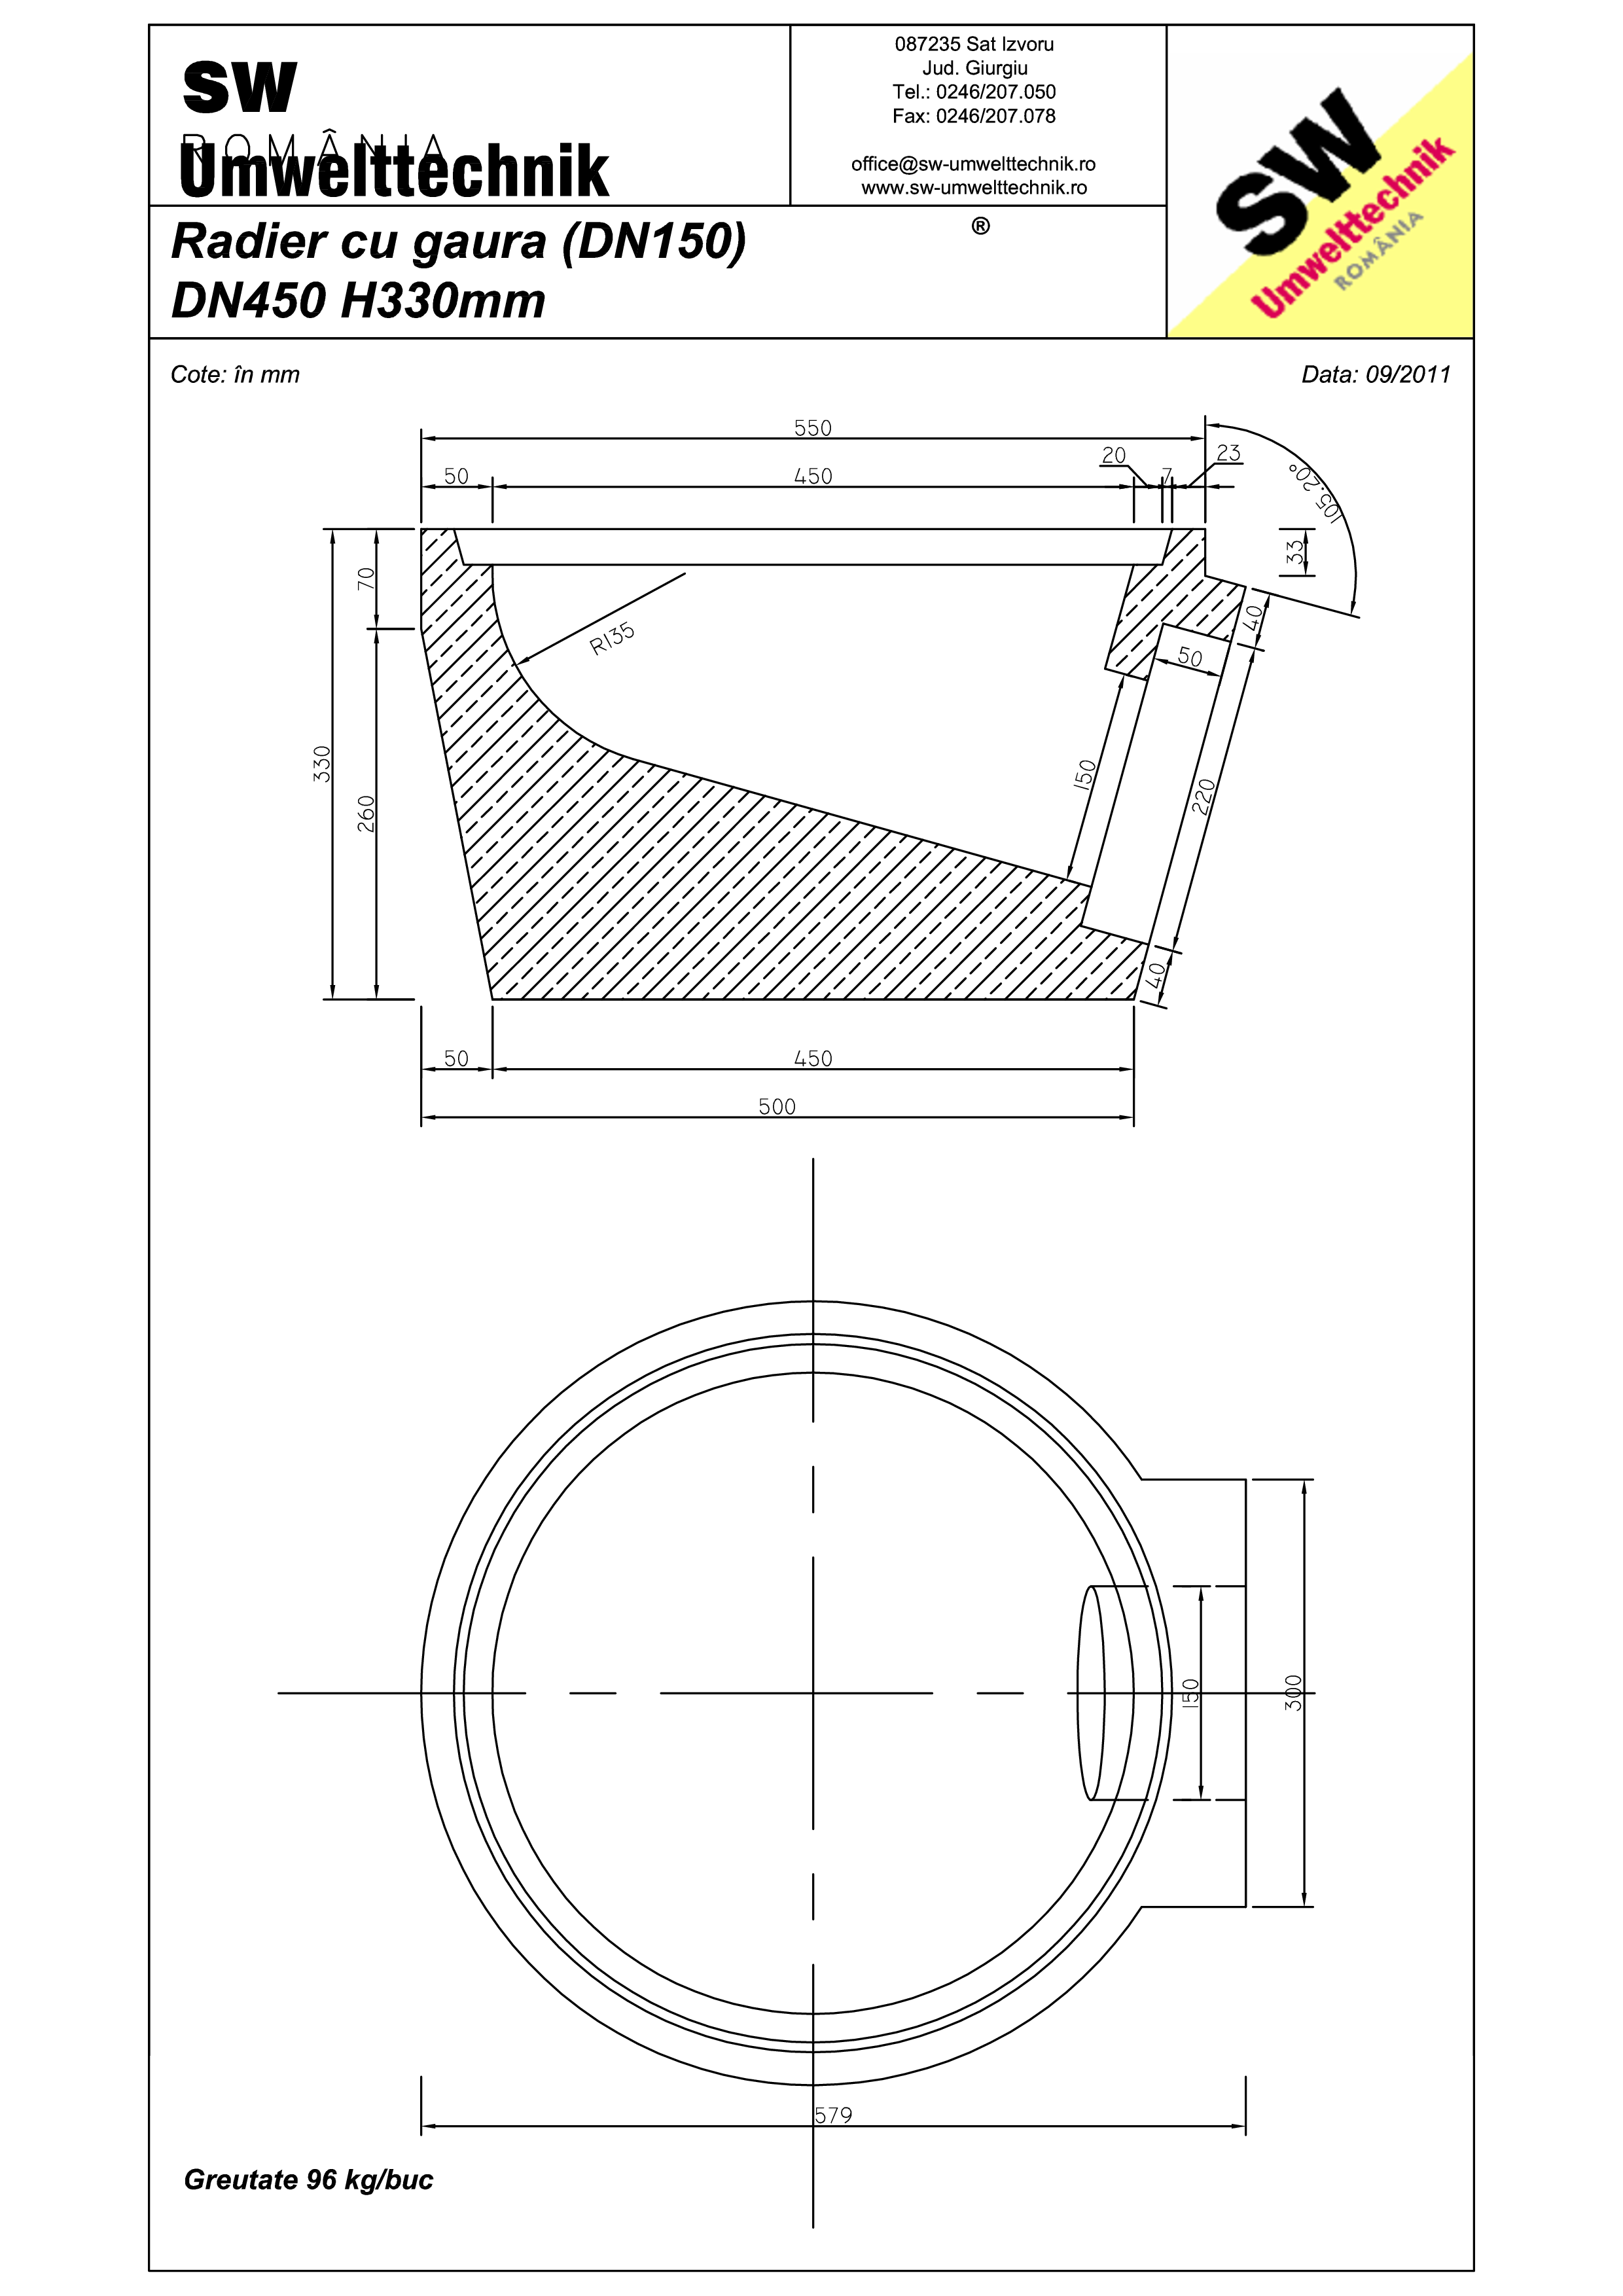 Pagina 1 - CAD-PDF Plan Austria - radier cu gaura DN150 SW UMWELTTECHNIK Detaliu de produs